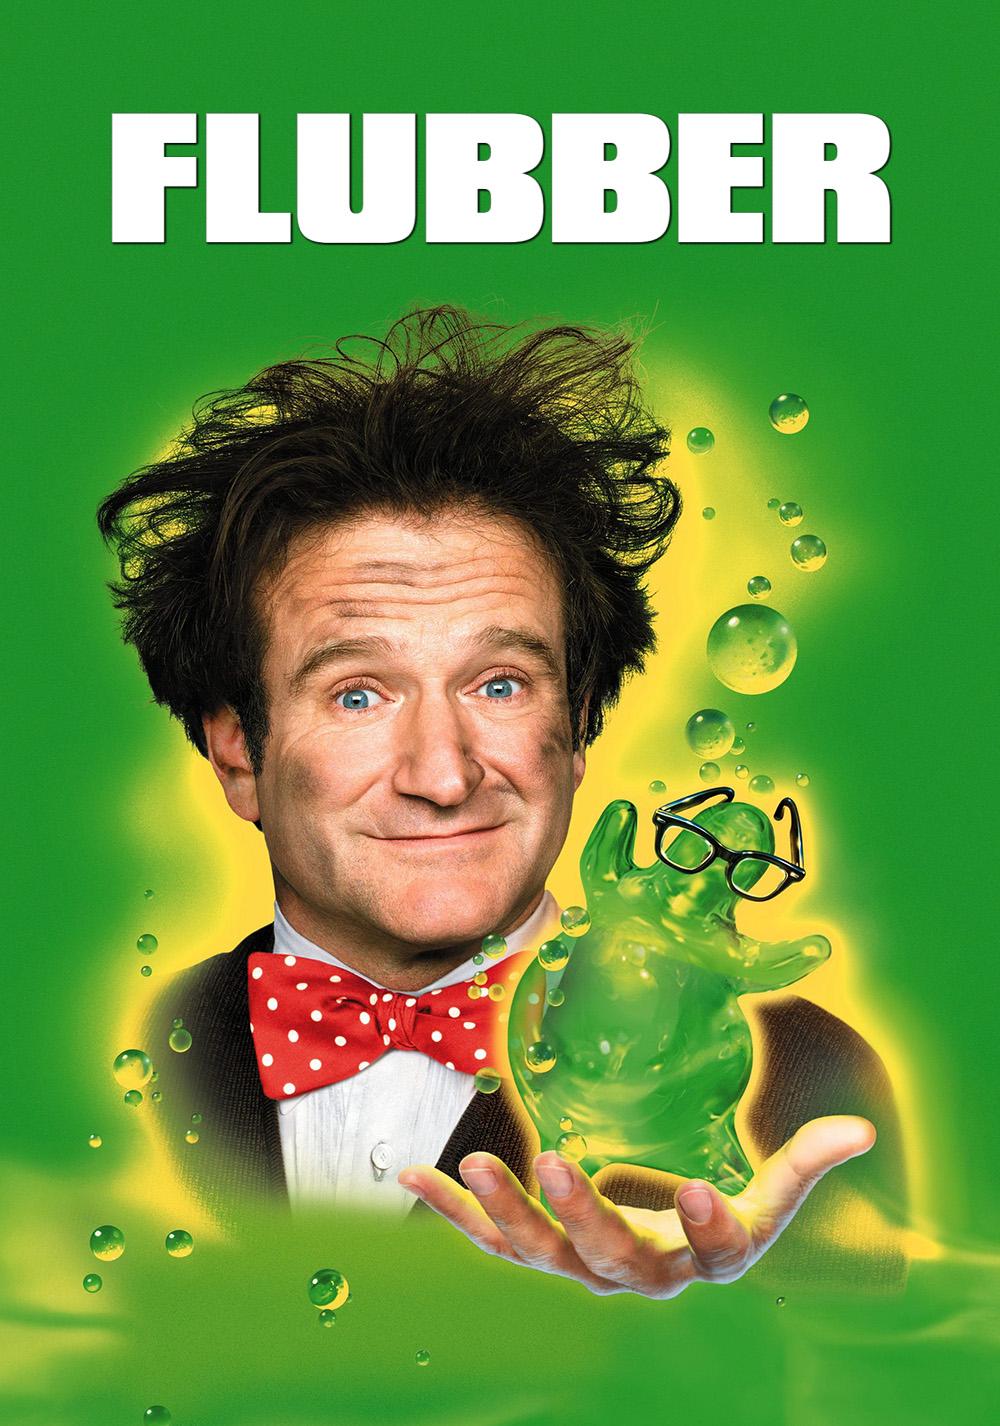 Flubber | Movie fanart | fanart.tv